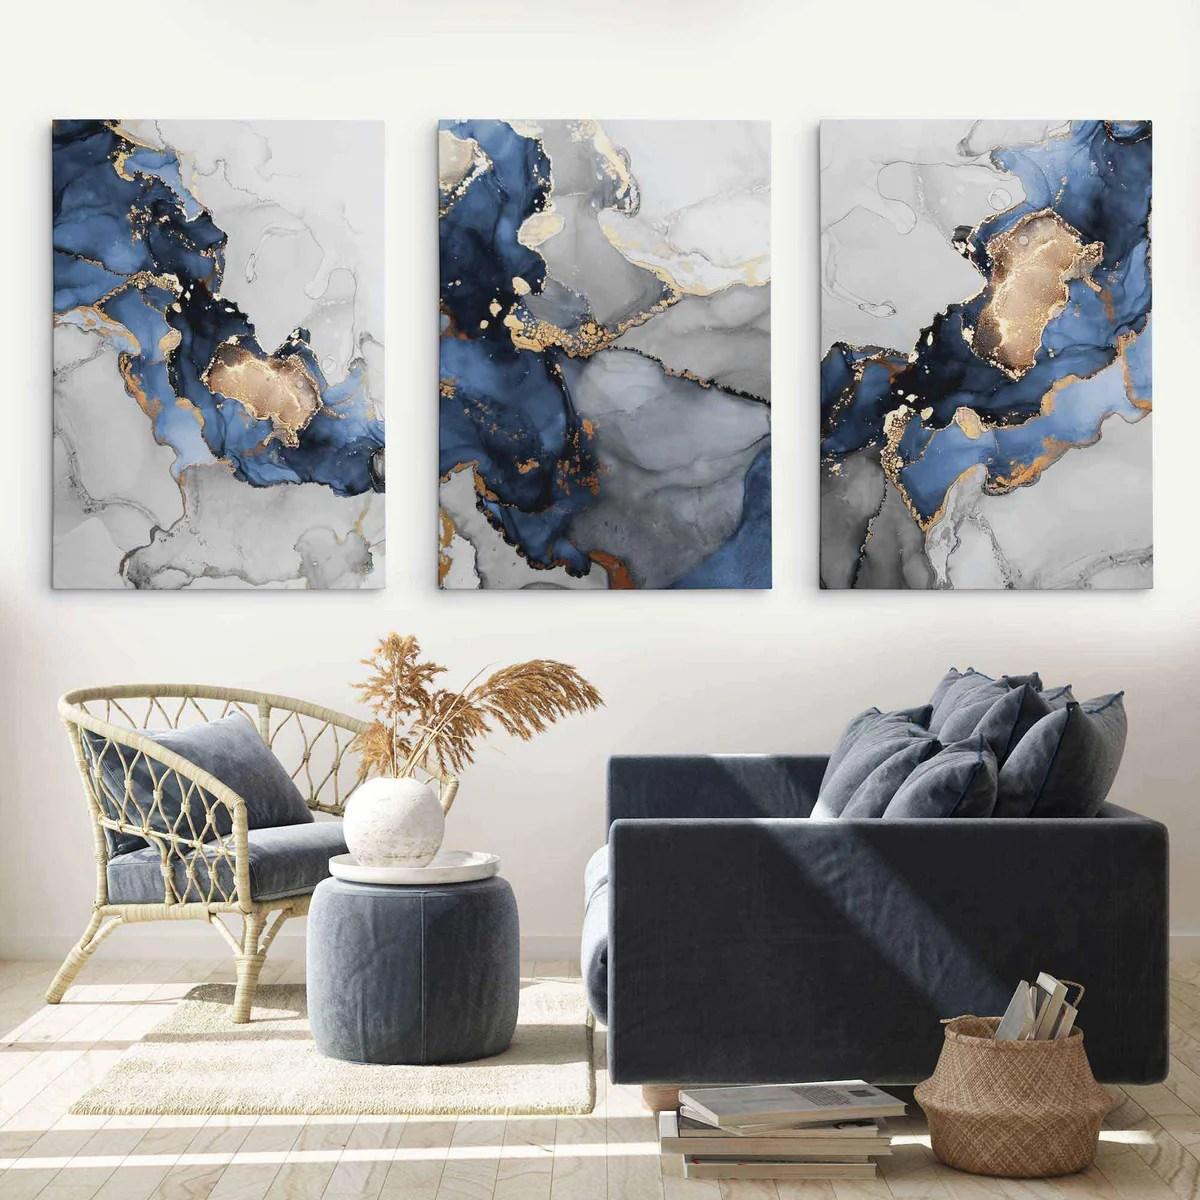 Set Of 3 Box Canvas Abstract Art Navy Blue Grey And Gold Artze Wall Art